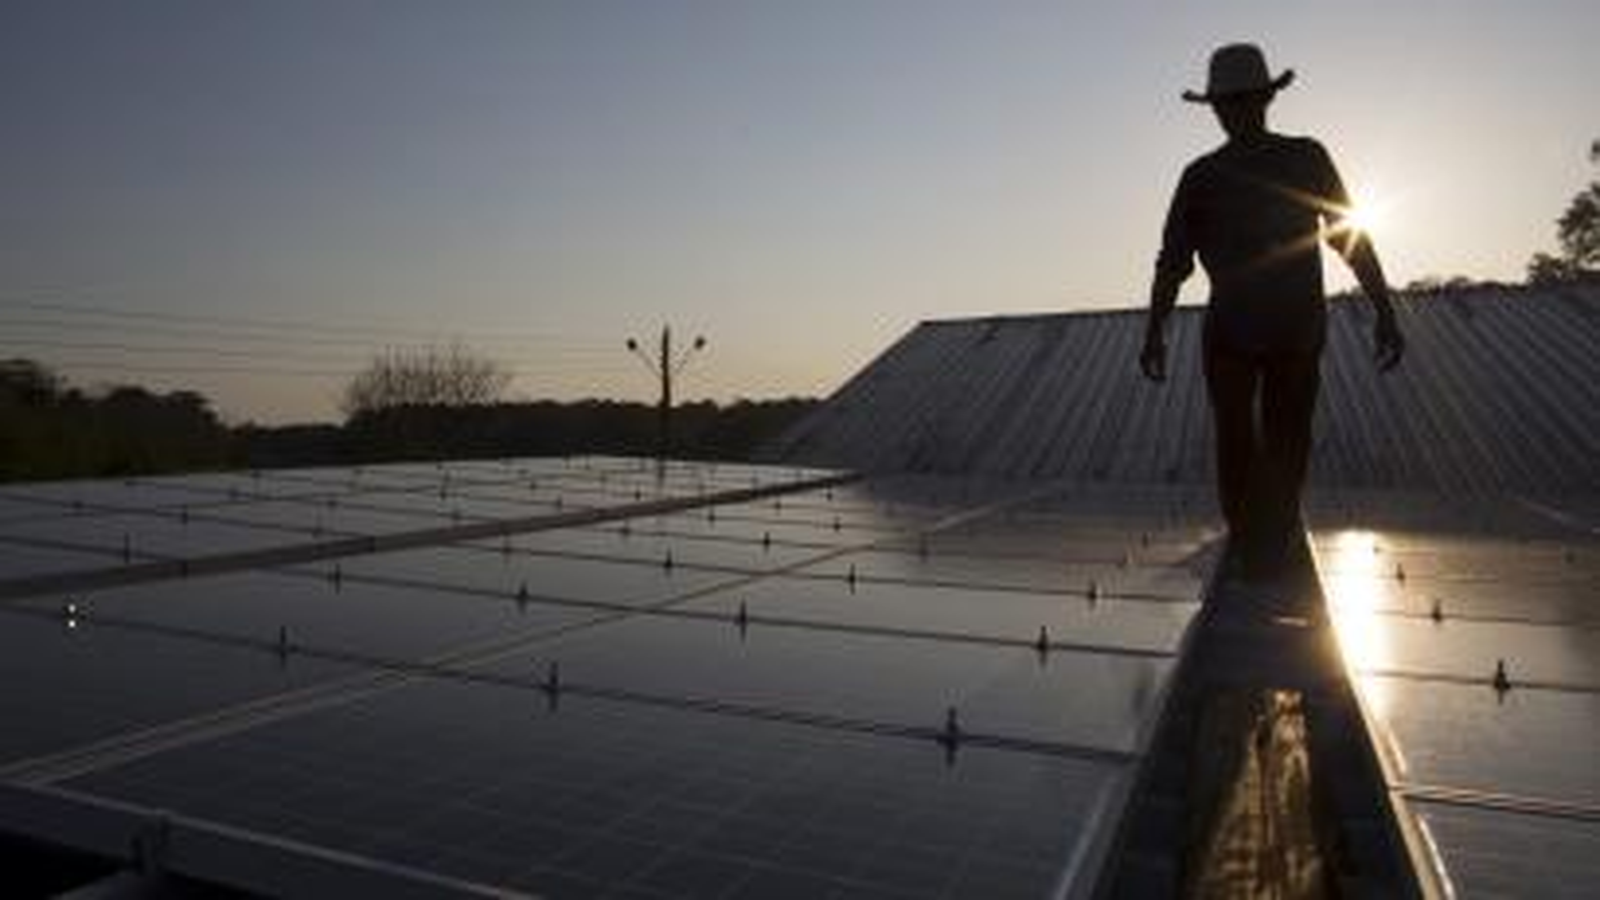 Man walking between solar panels.